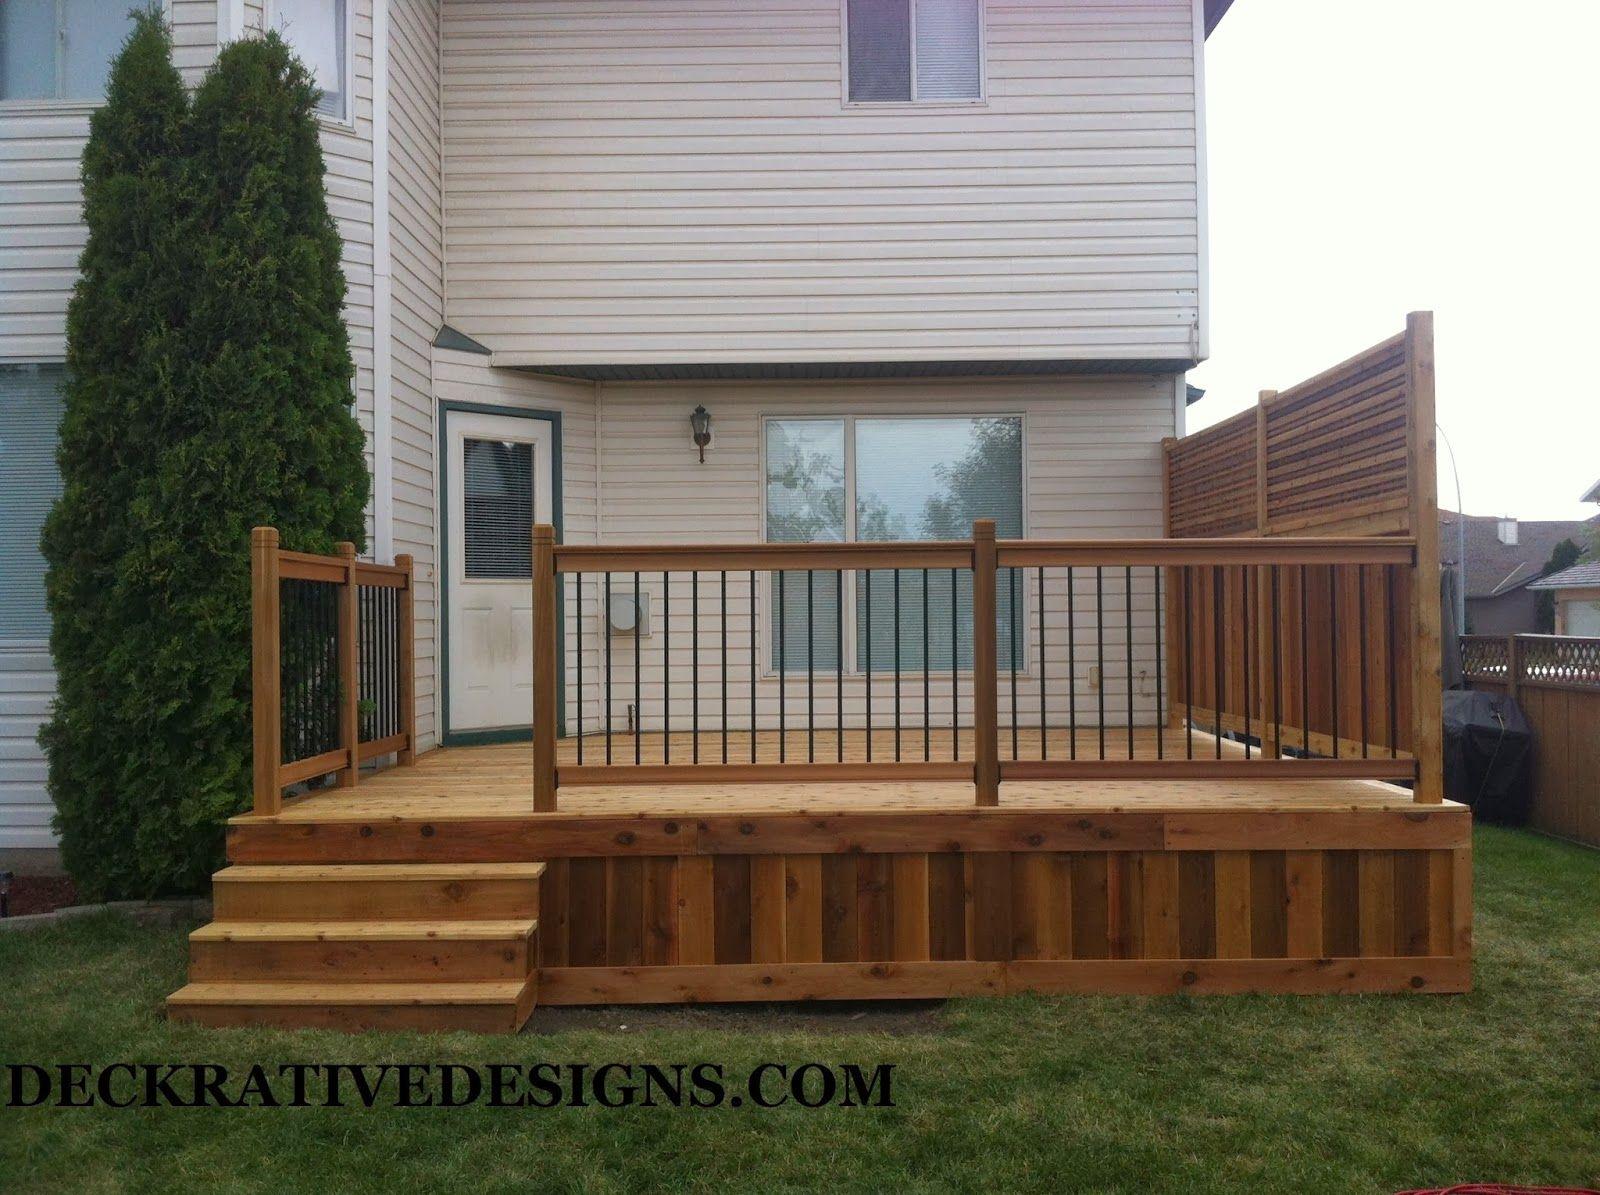 Calgary Decking Designs With Cedar Lattice And Skirting Deck